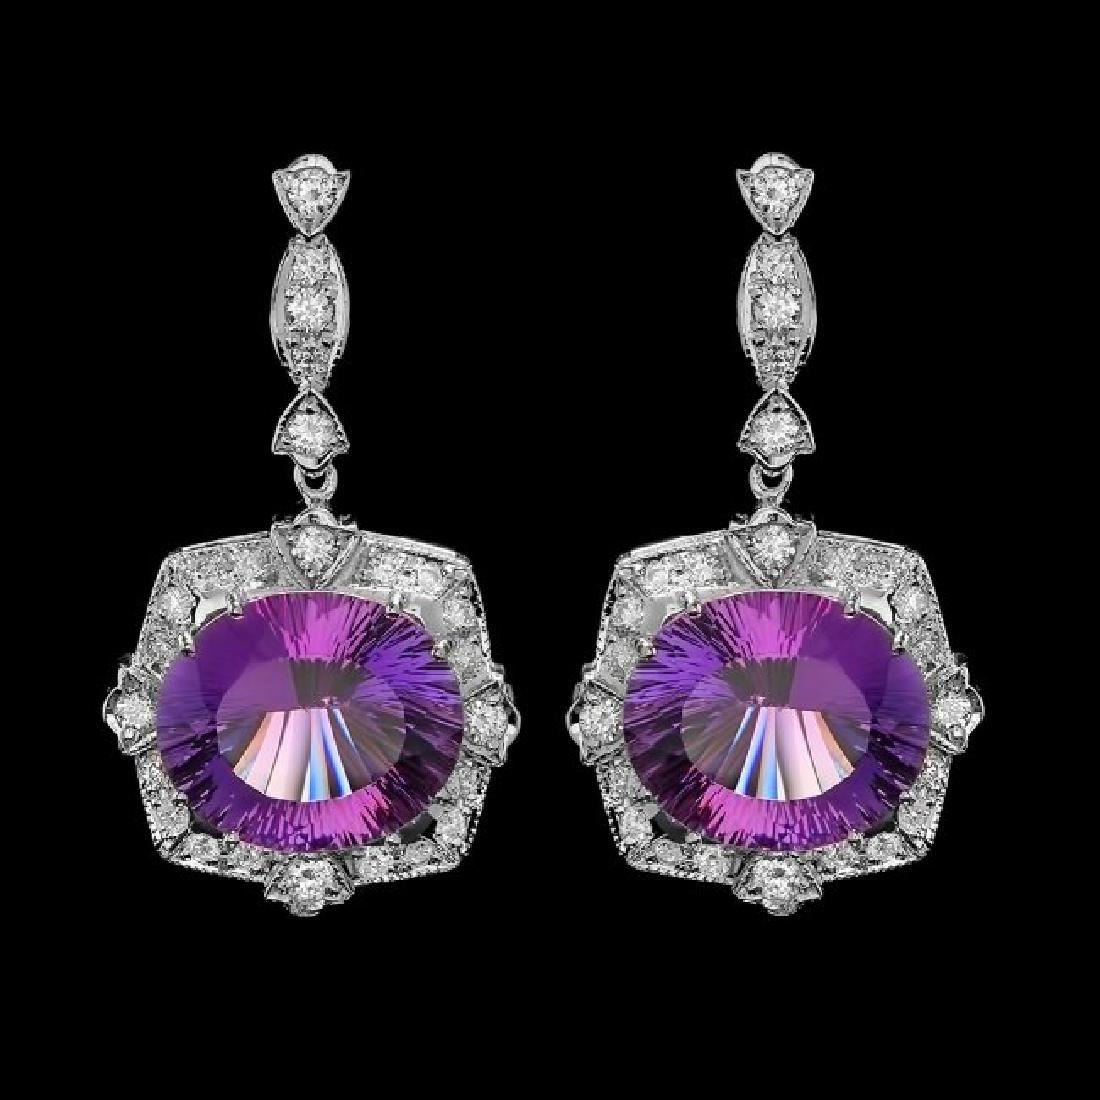 14k Gold 18.00ct Amethyst 1.90ct Diamond Earrings